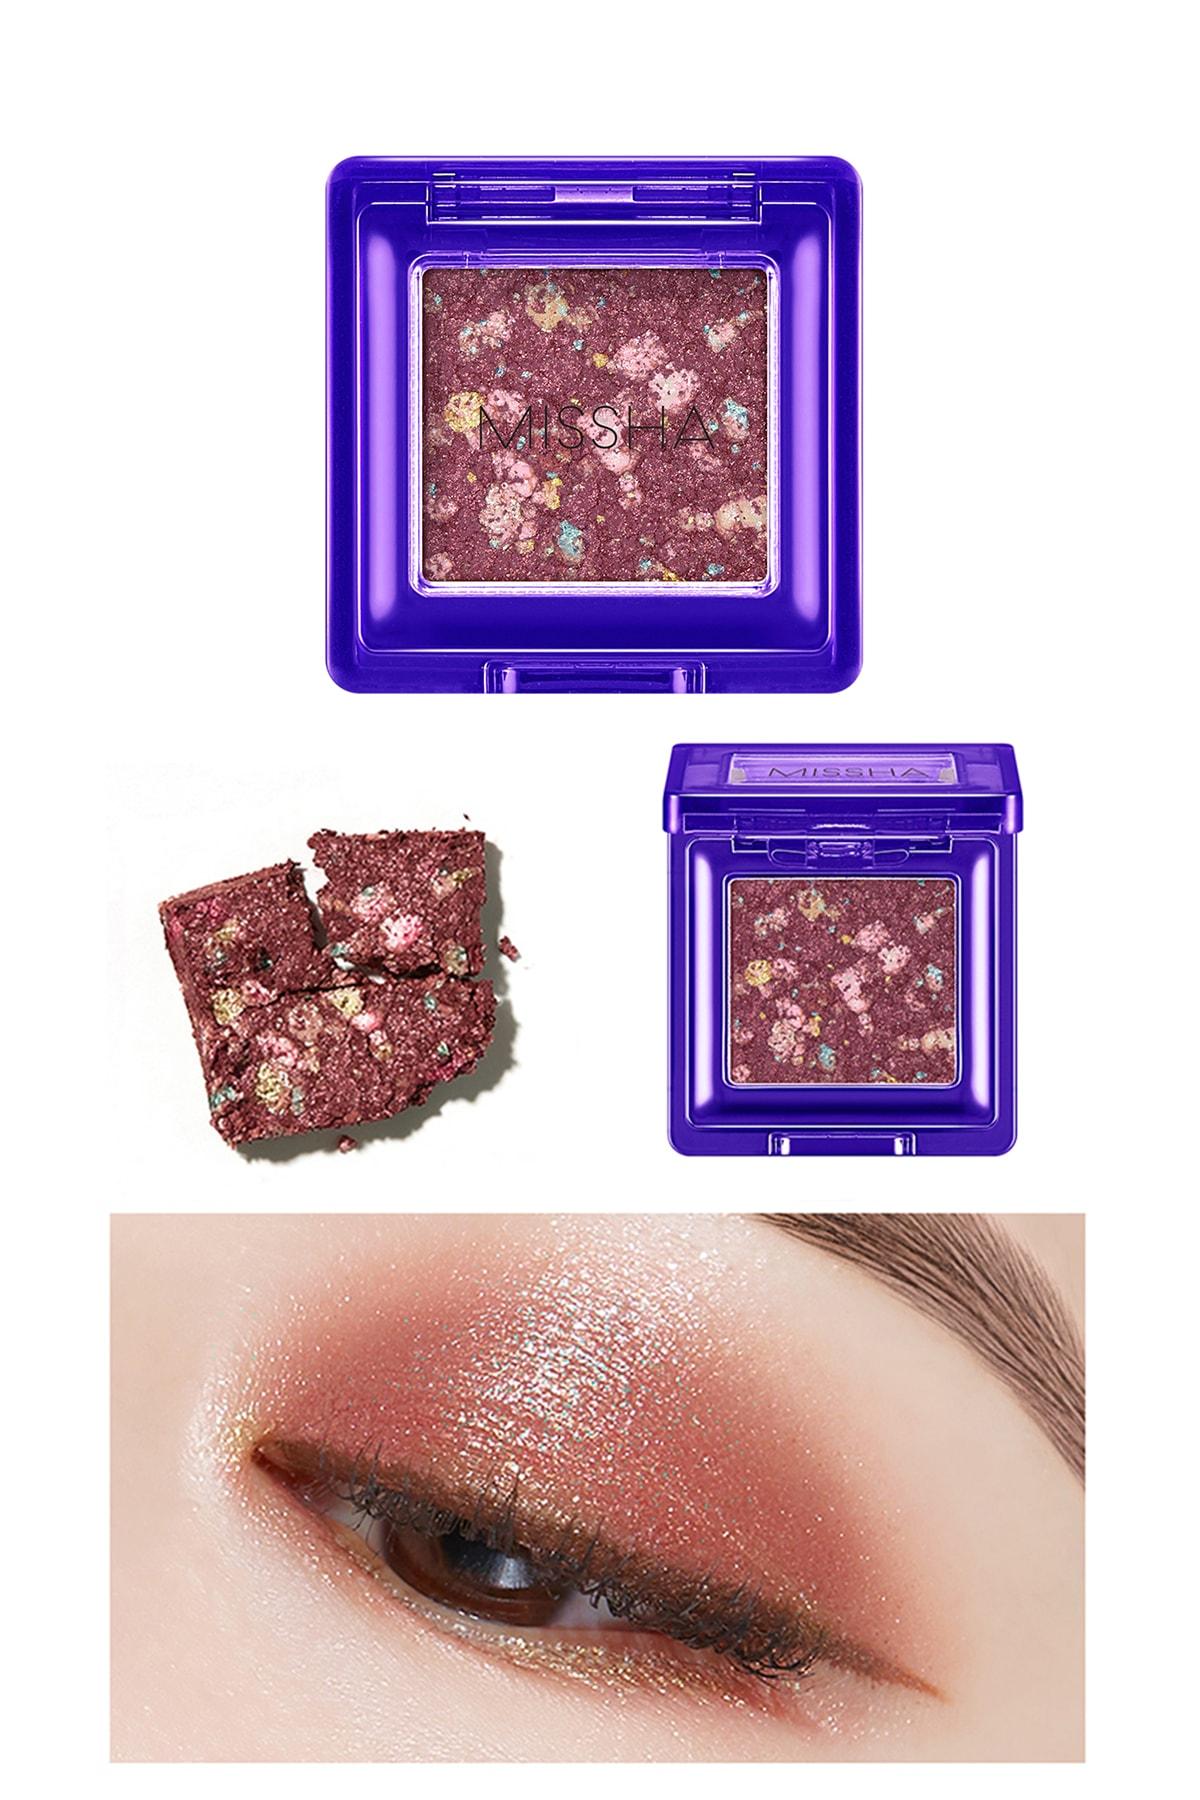 Missha Yoğun Pigmentli Parıltılı Metalik Tekli Far MISSHA Glitter Prism Metal (No.5)